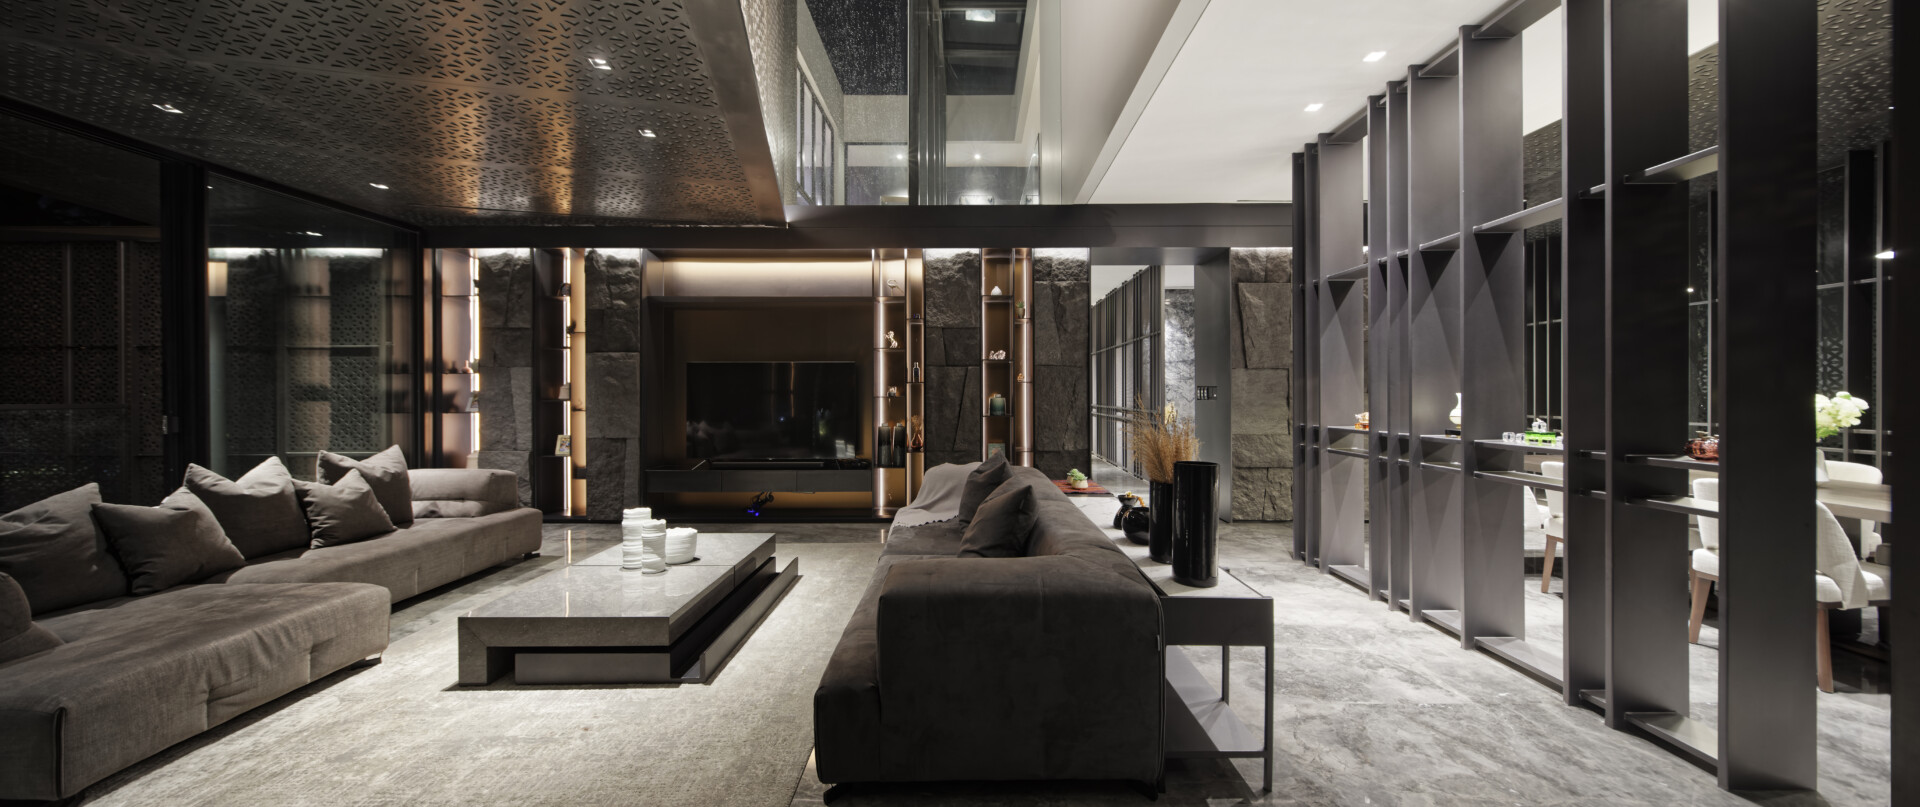 GOLFN HOUSE - Image 16